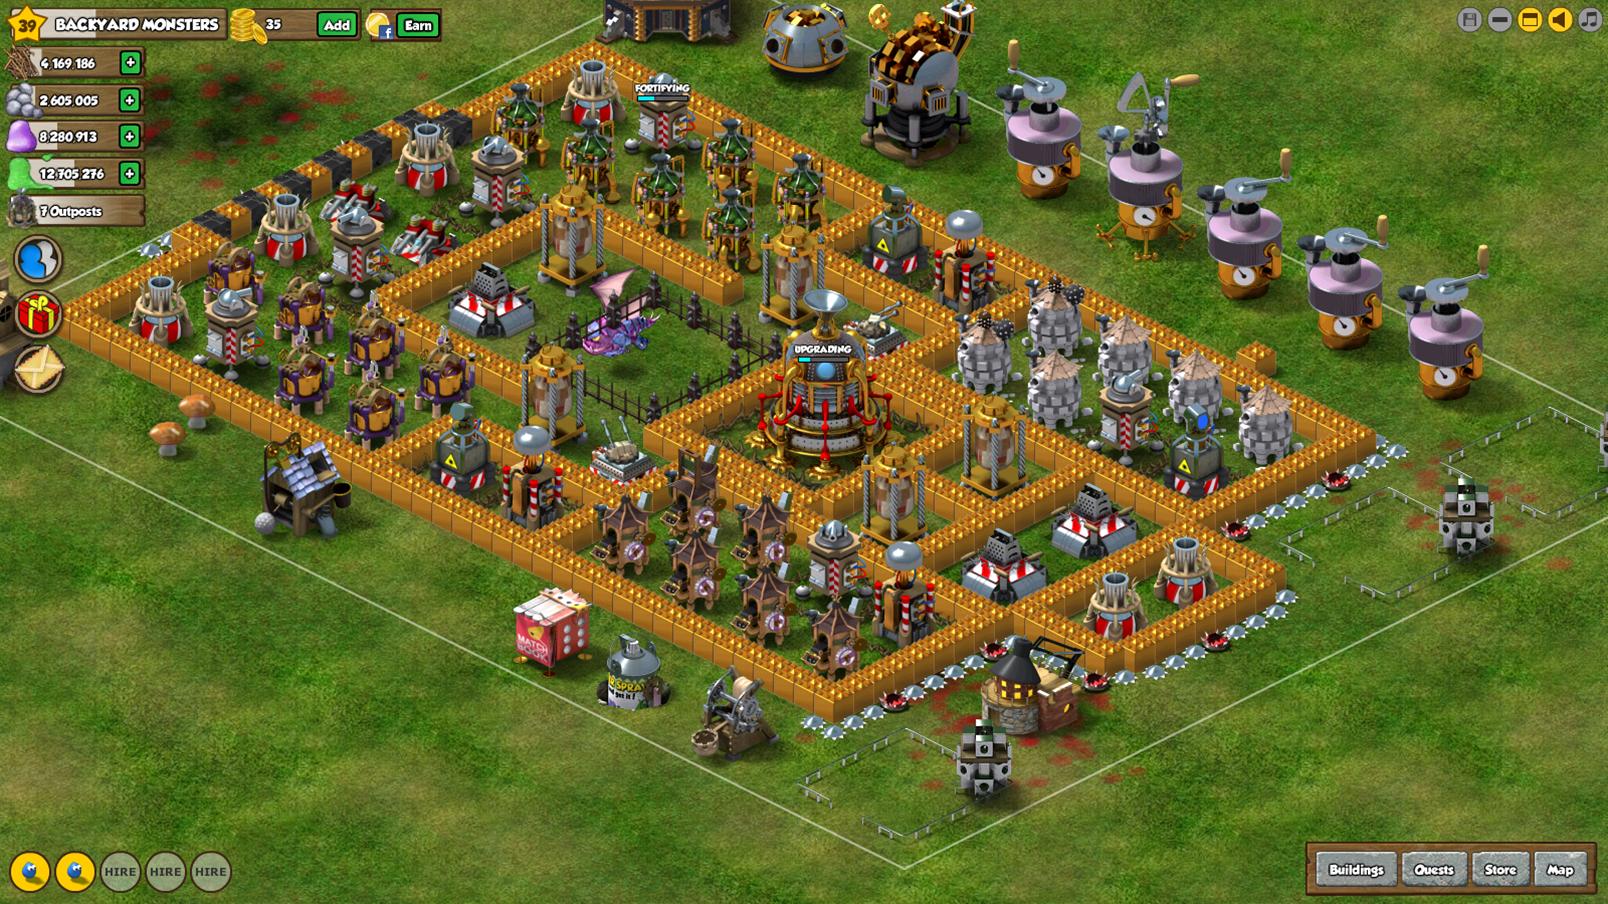 Backyard Monsters Best Base image - th best cell base ever | backyard monsters wiki | fandom